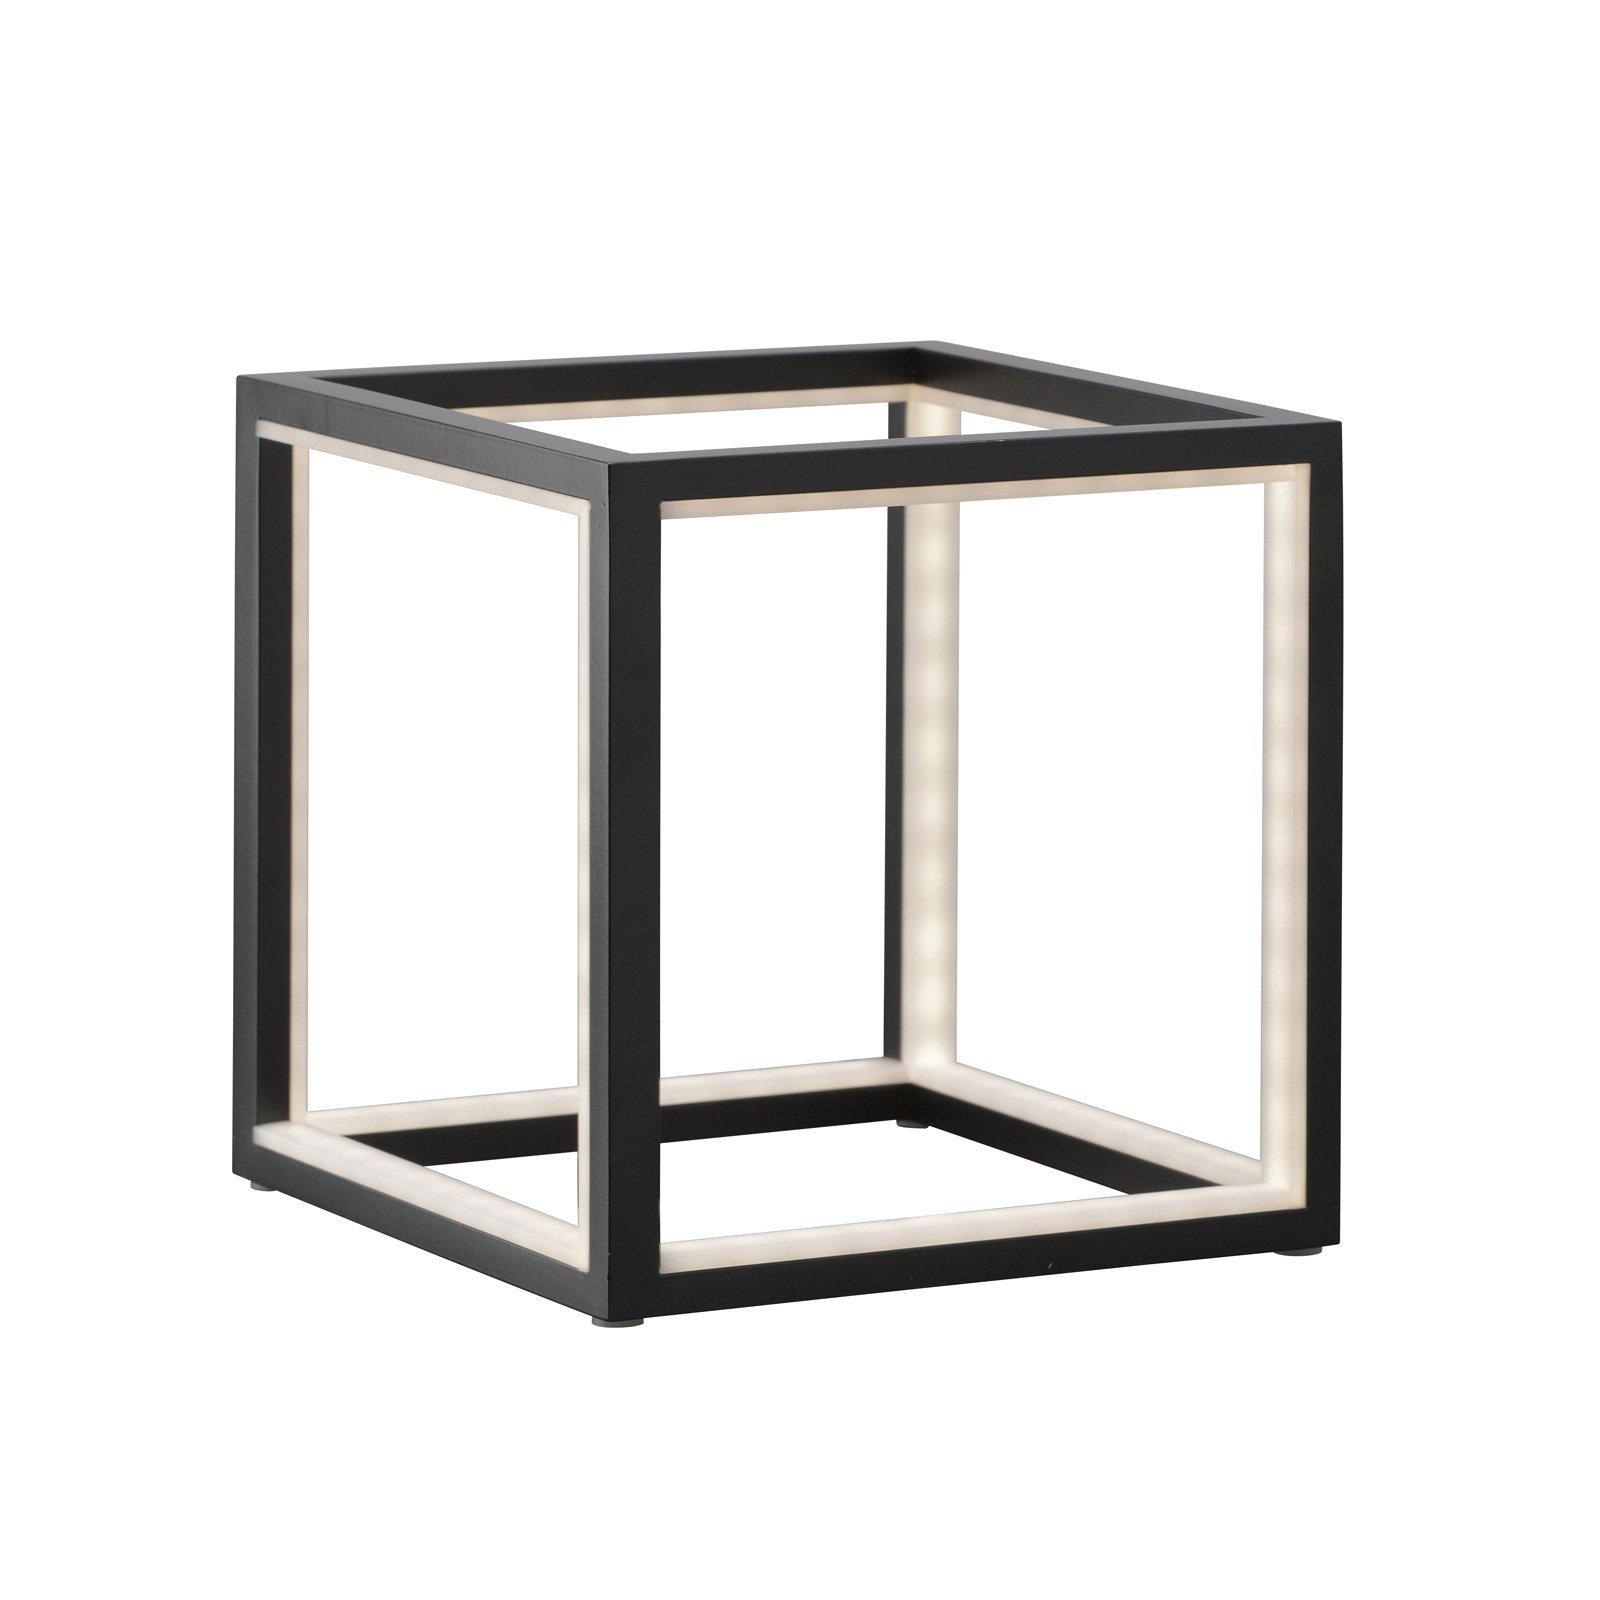 LED-bordlampe Delux, svart, 20 cm